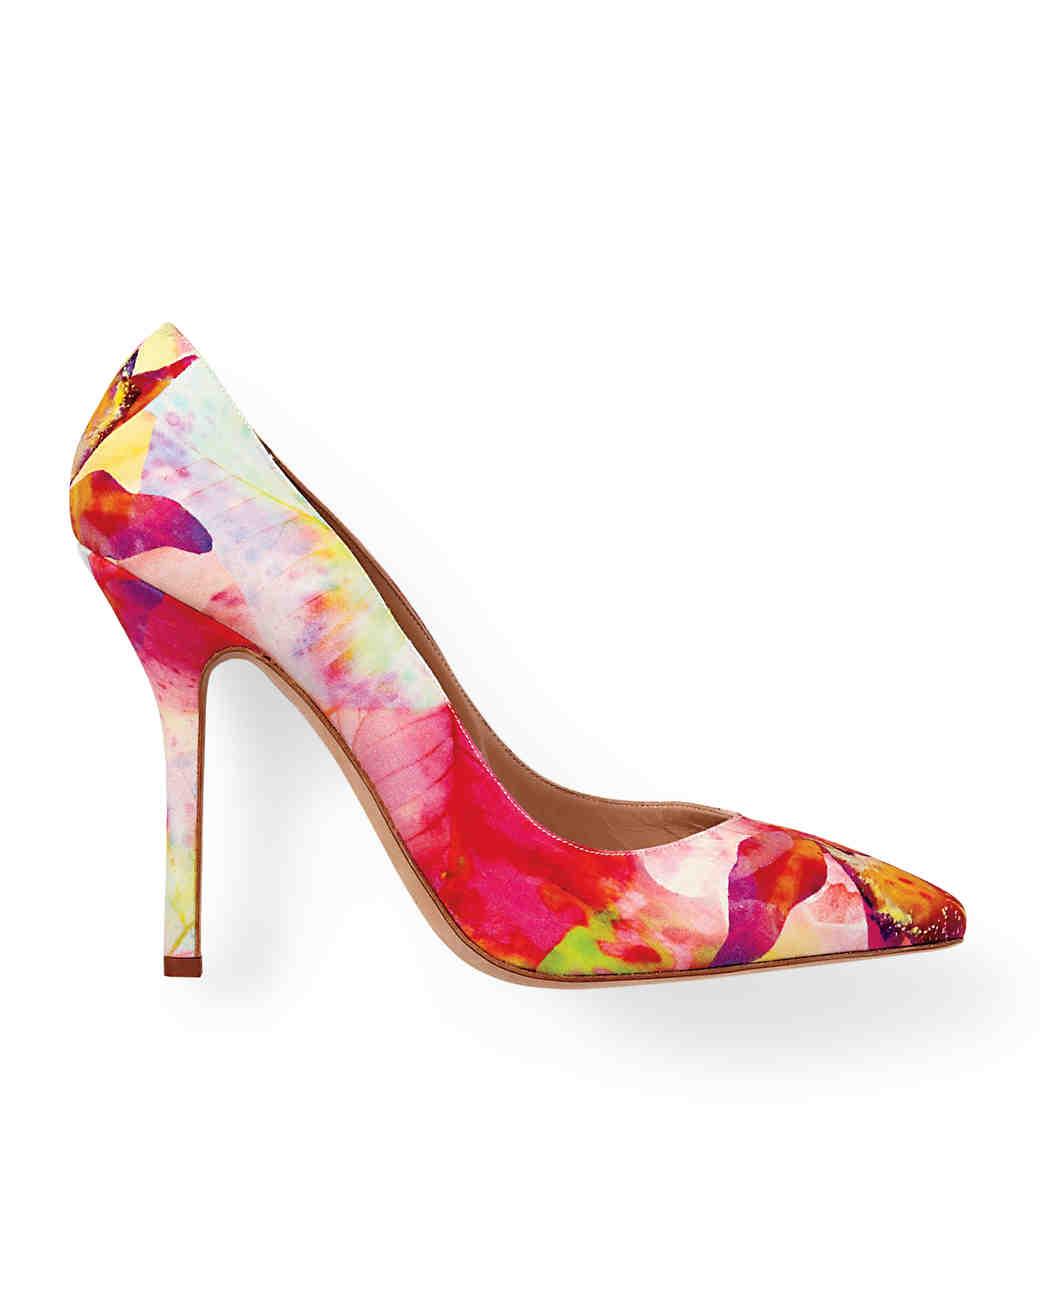 shoes-008-mwd109642.jpg